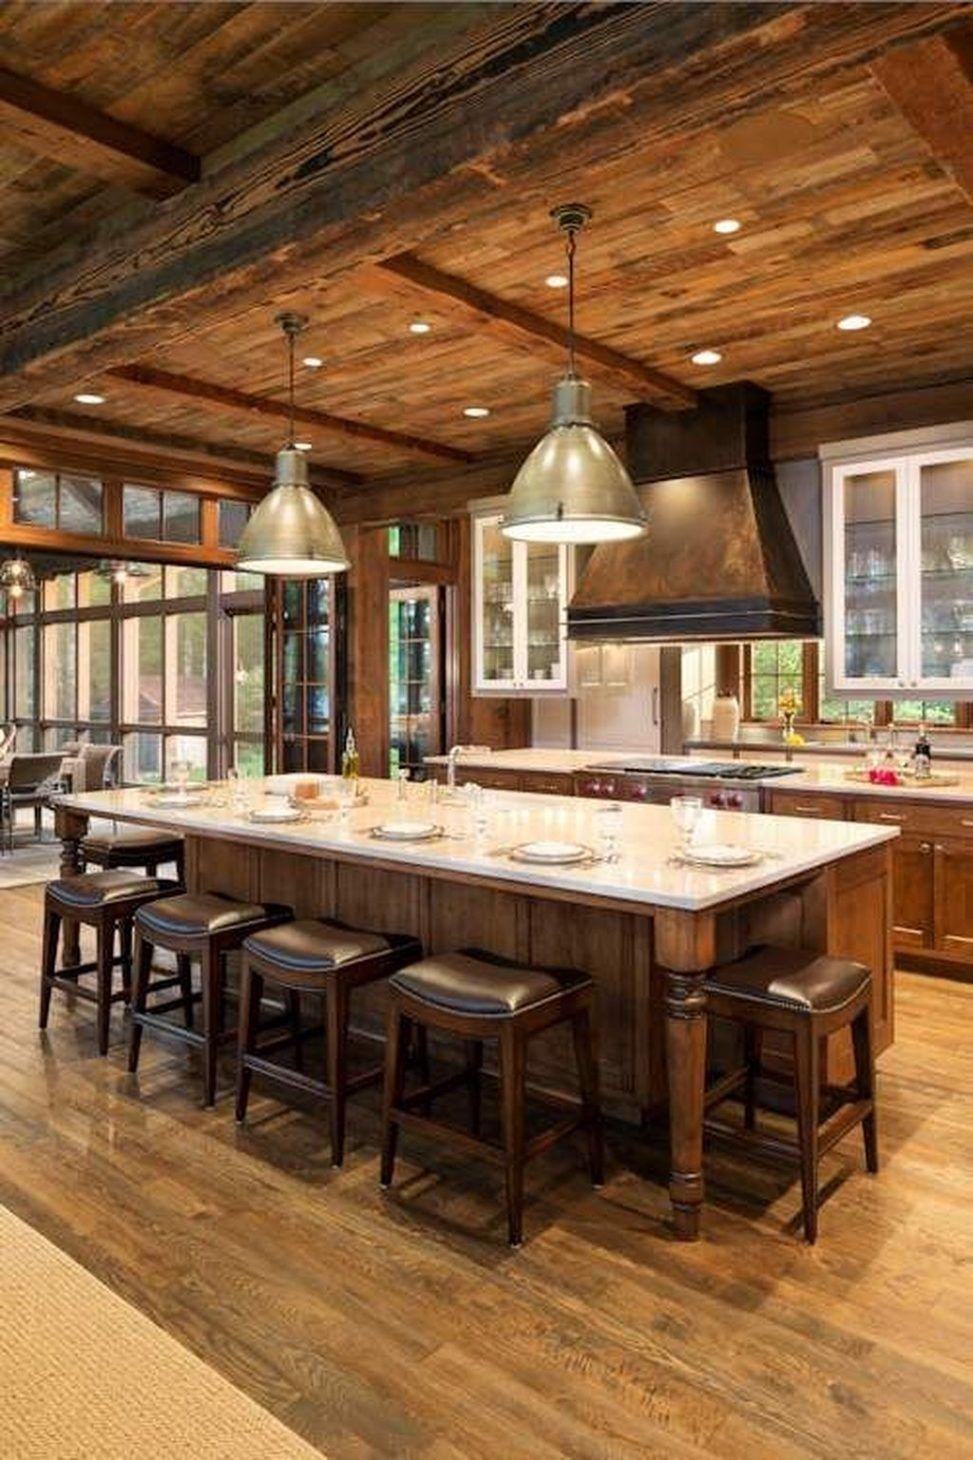 Amazing Rustic Lake House Decorating Ideas 20 | Rustic ...